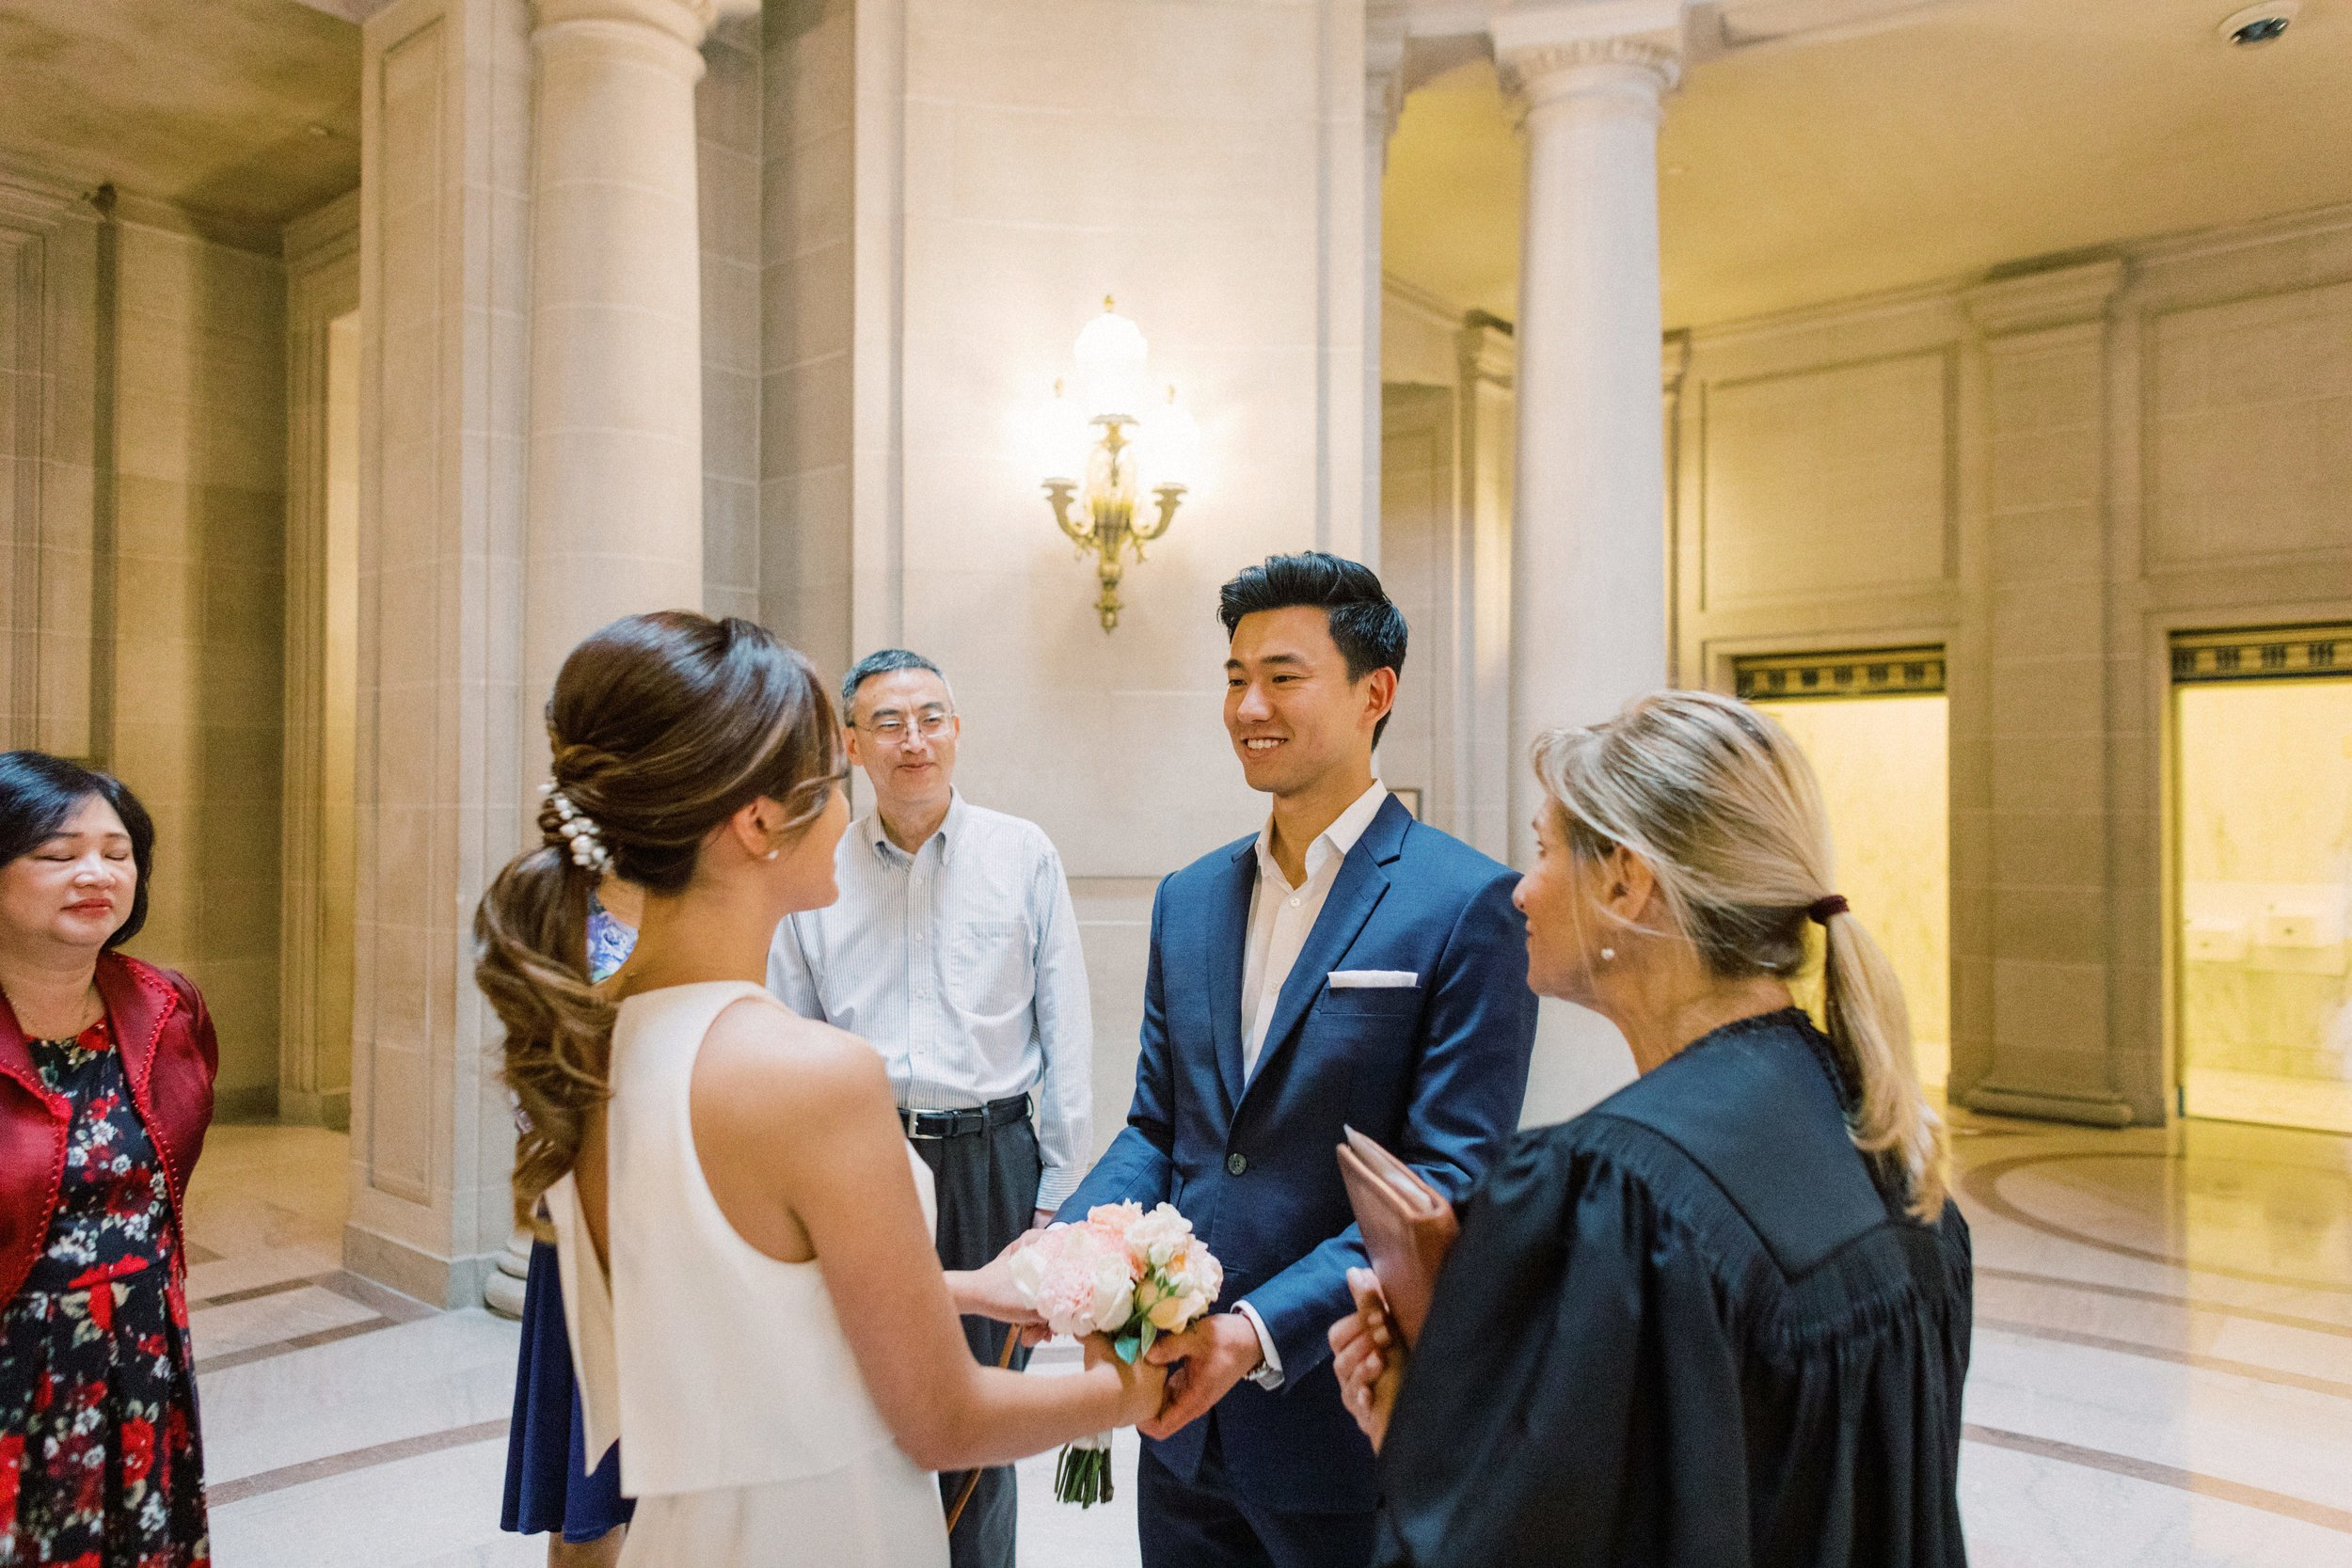 San-francisco-city-hall-photography-wedding-074.jpg